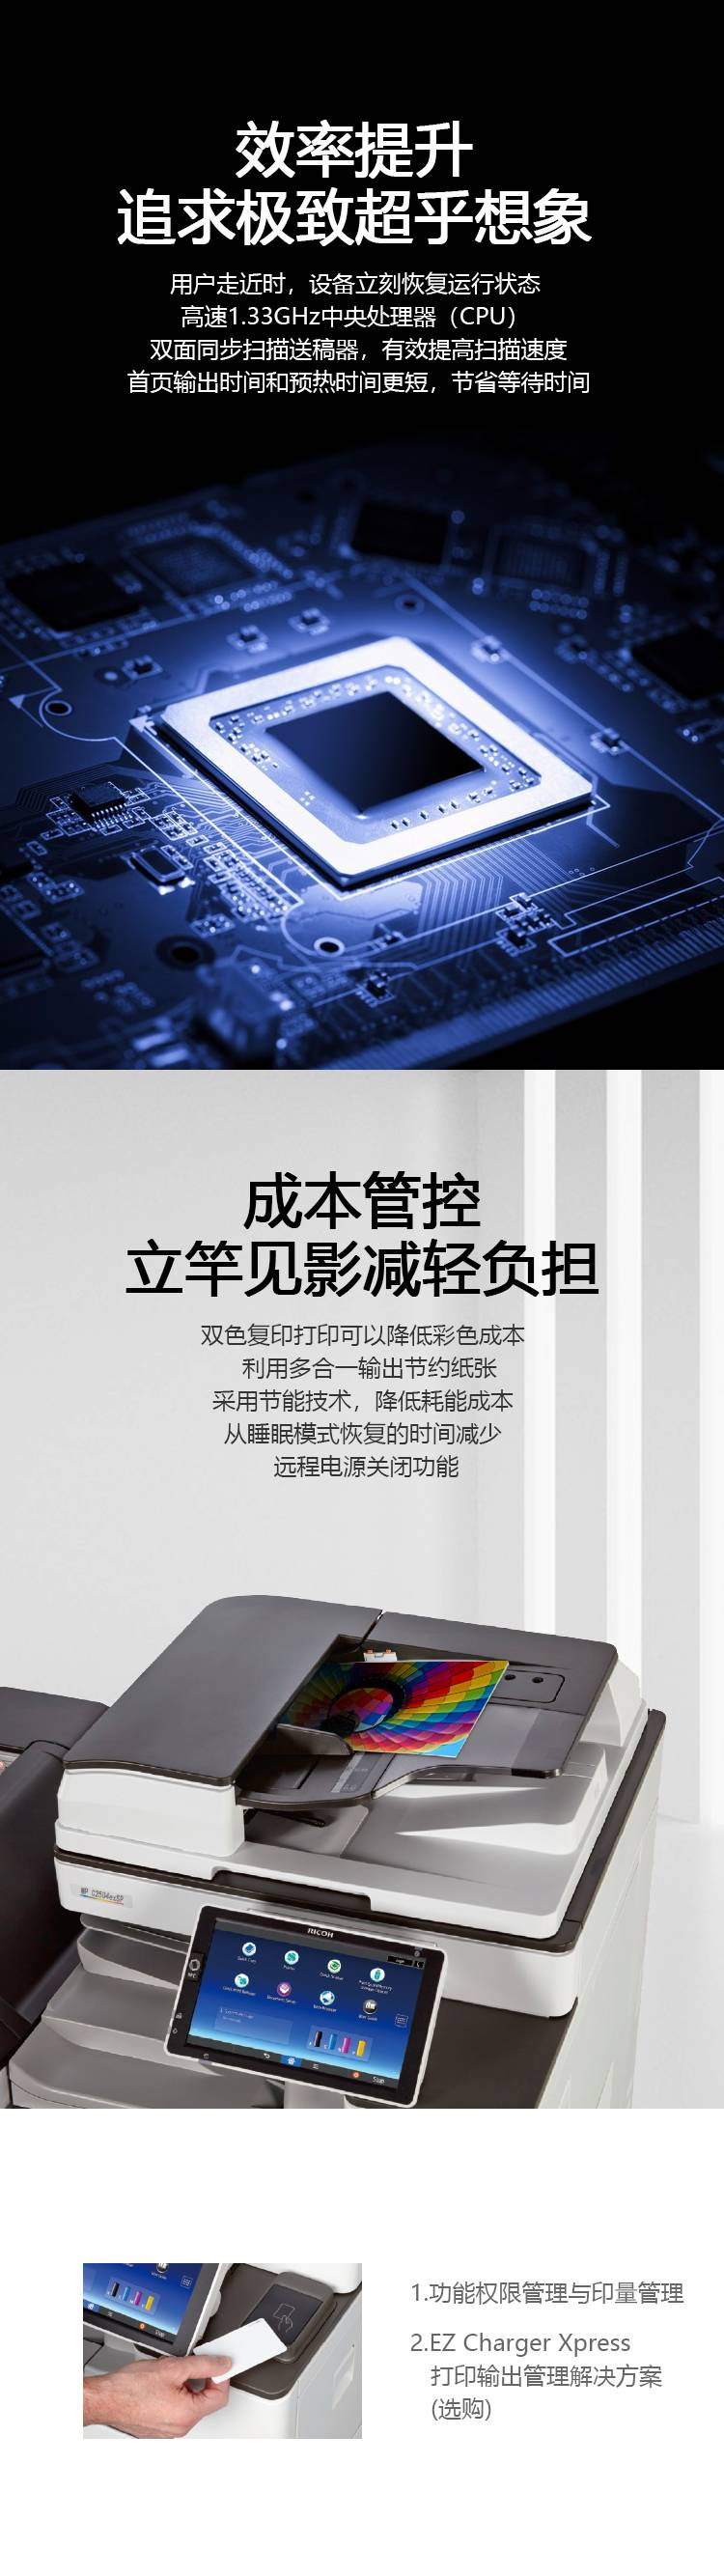 理光C2004exSP复印机-mmexport1552135872790